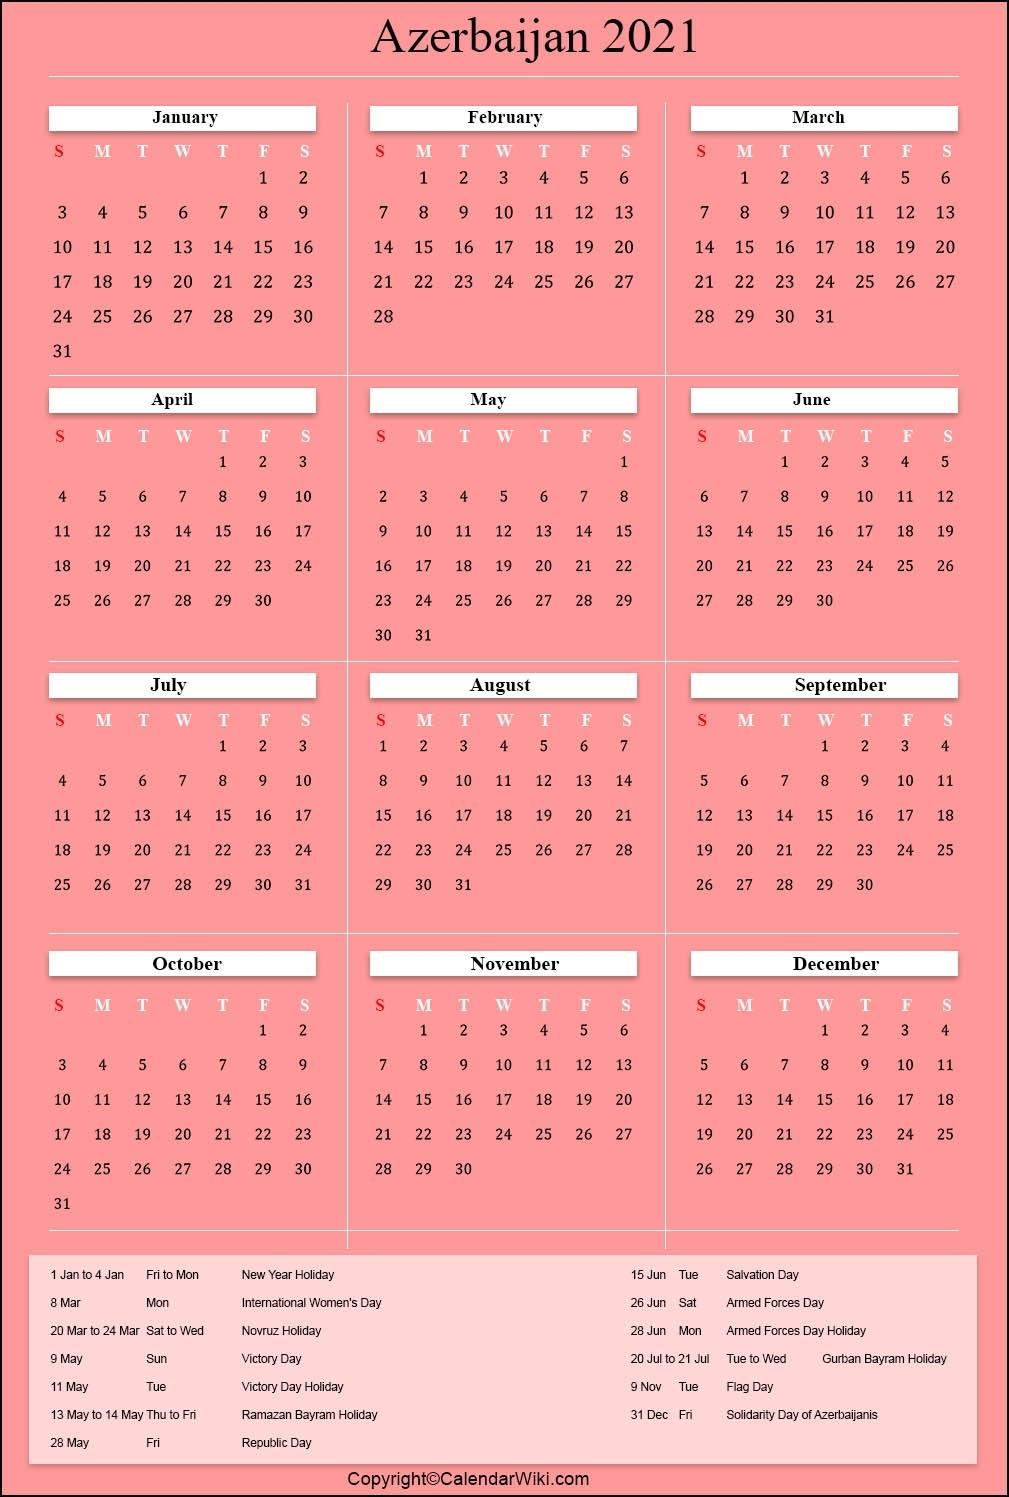 Printable Azerbaijan Calendar 2021 With Holidays [Public